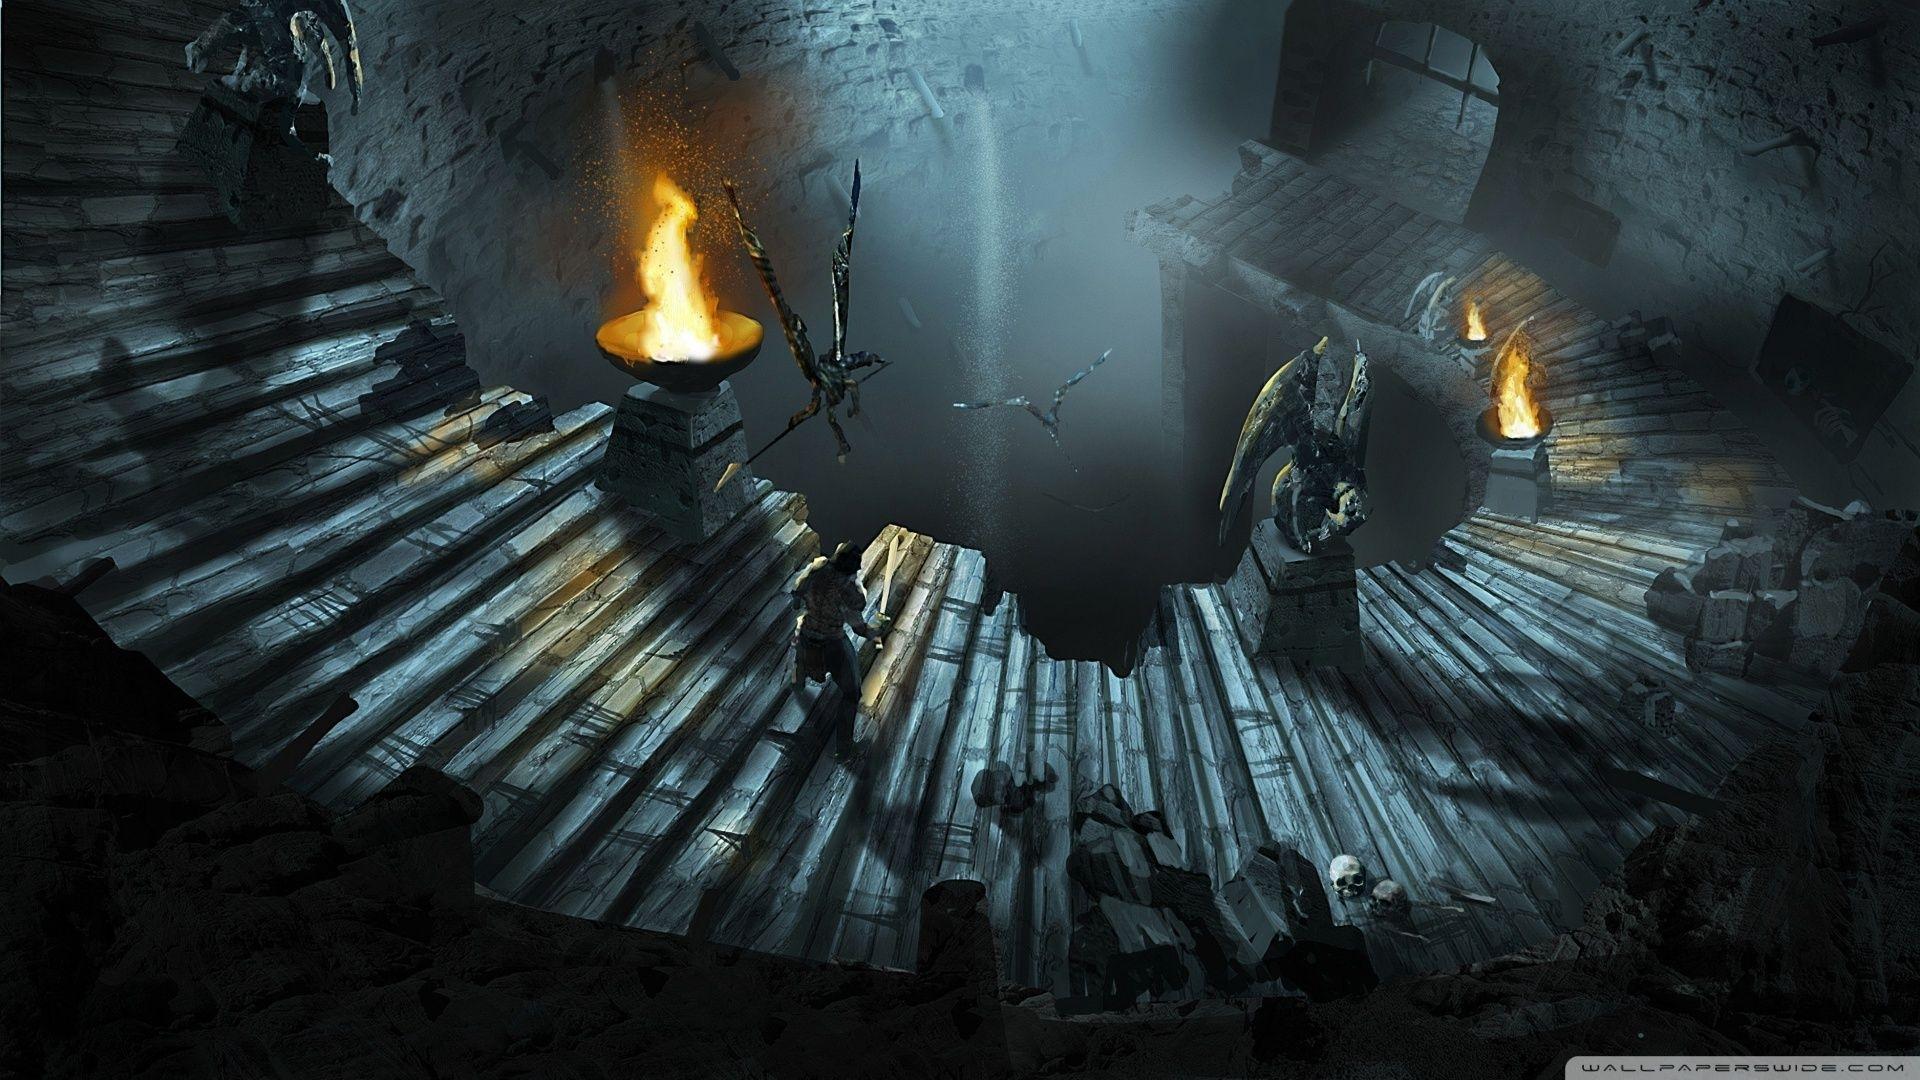 donjons et dragons fond d'écran hd